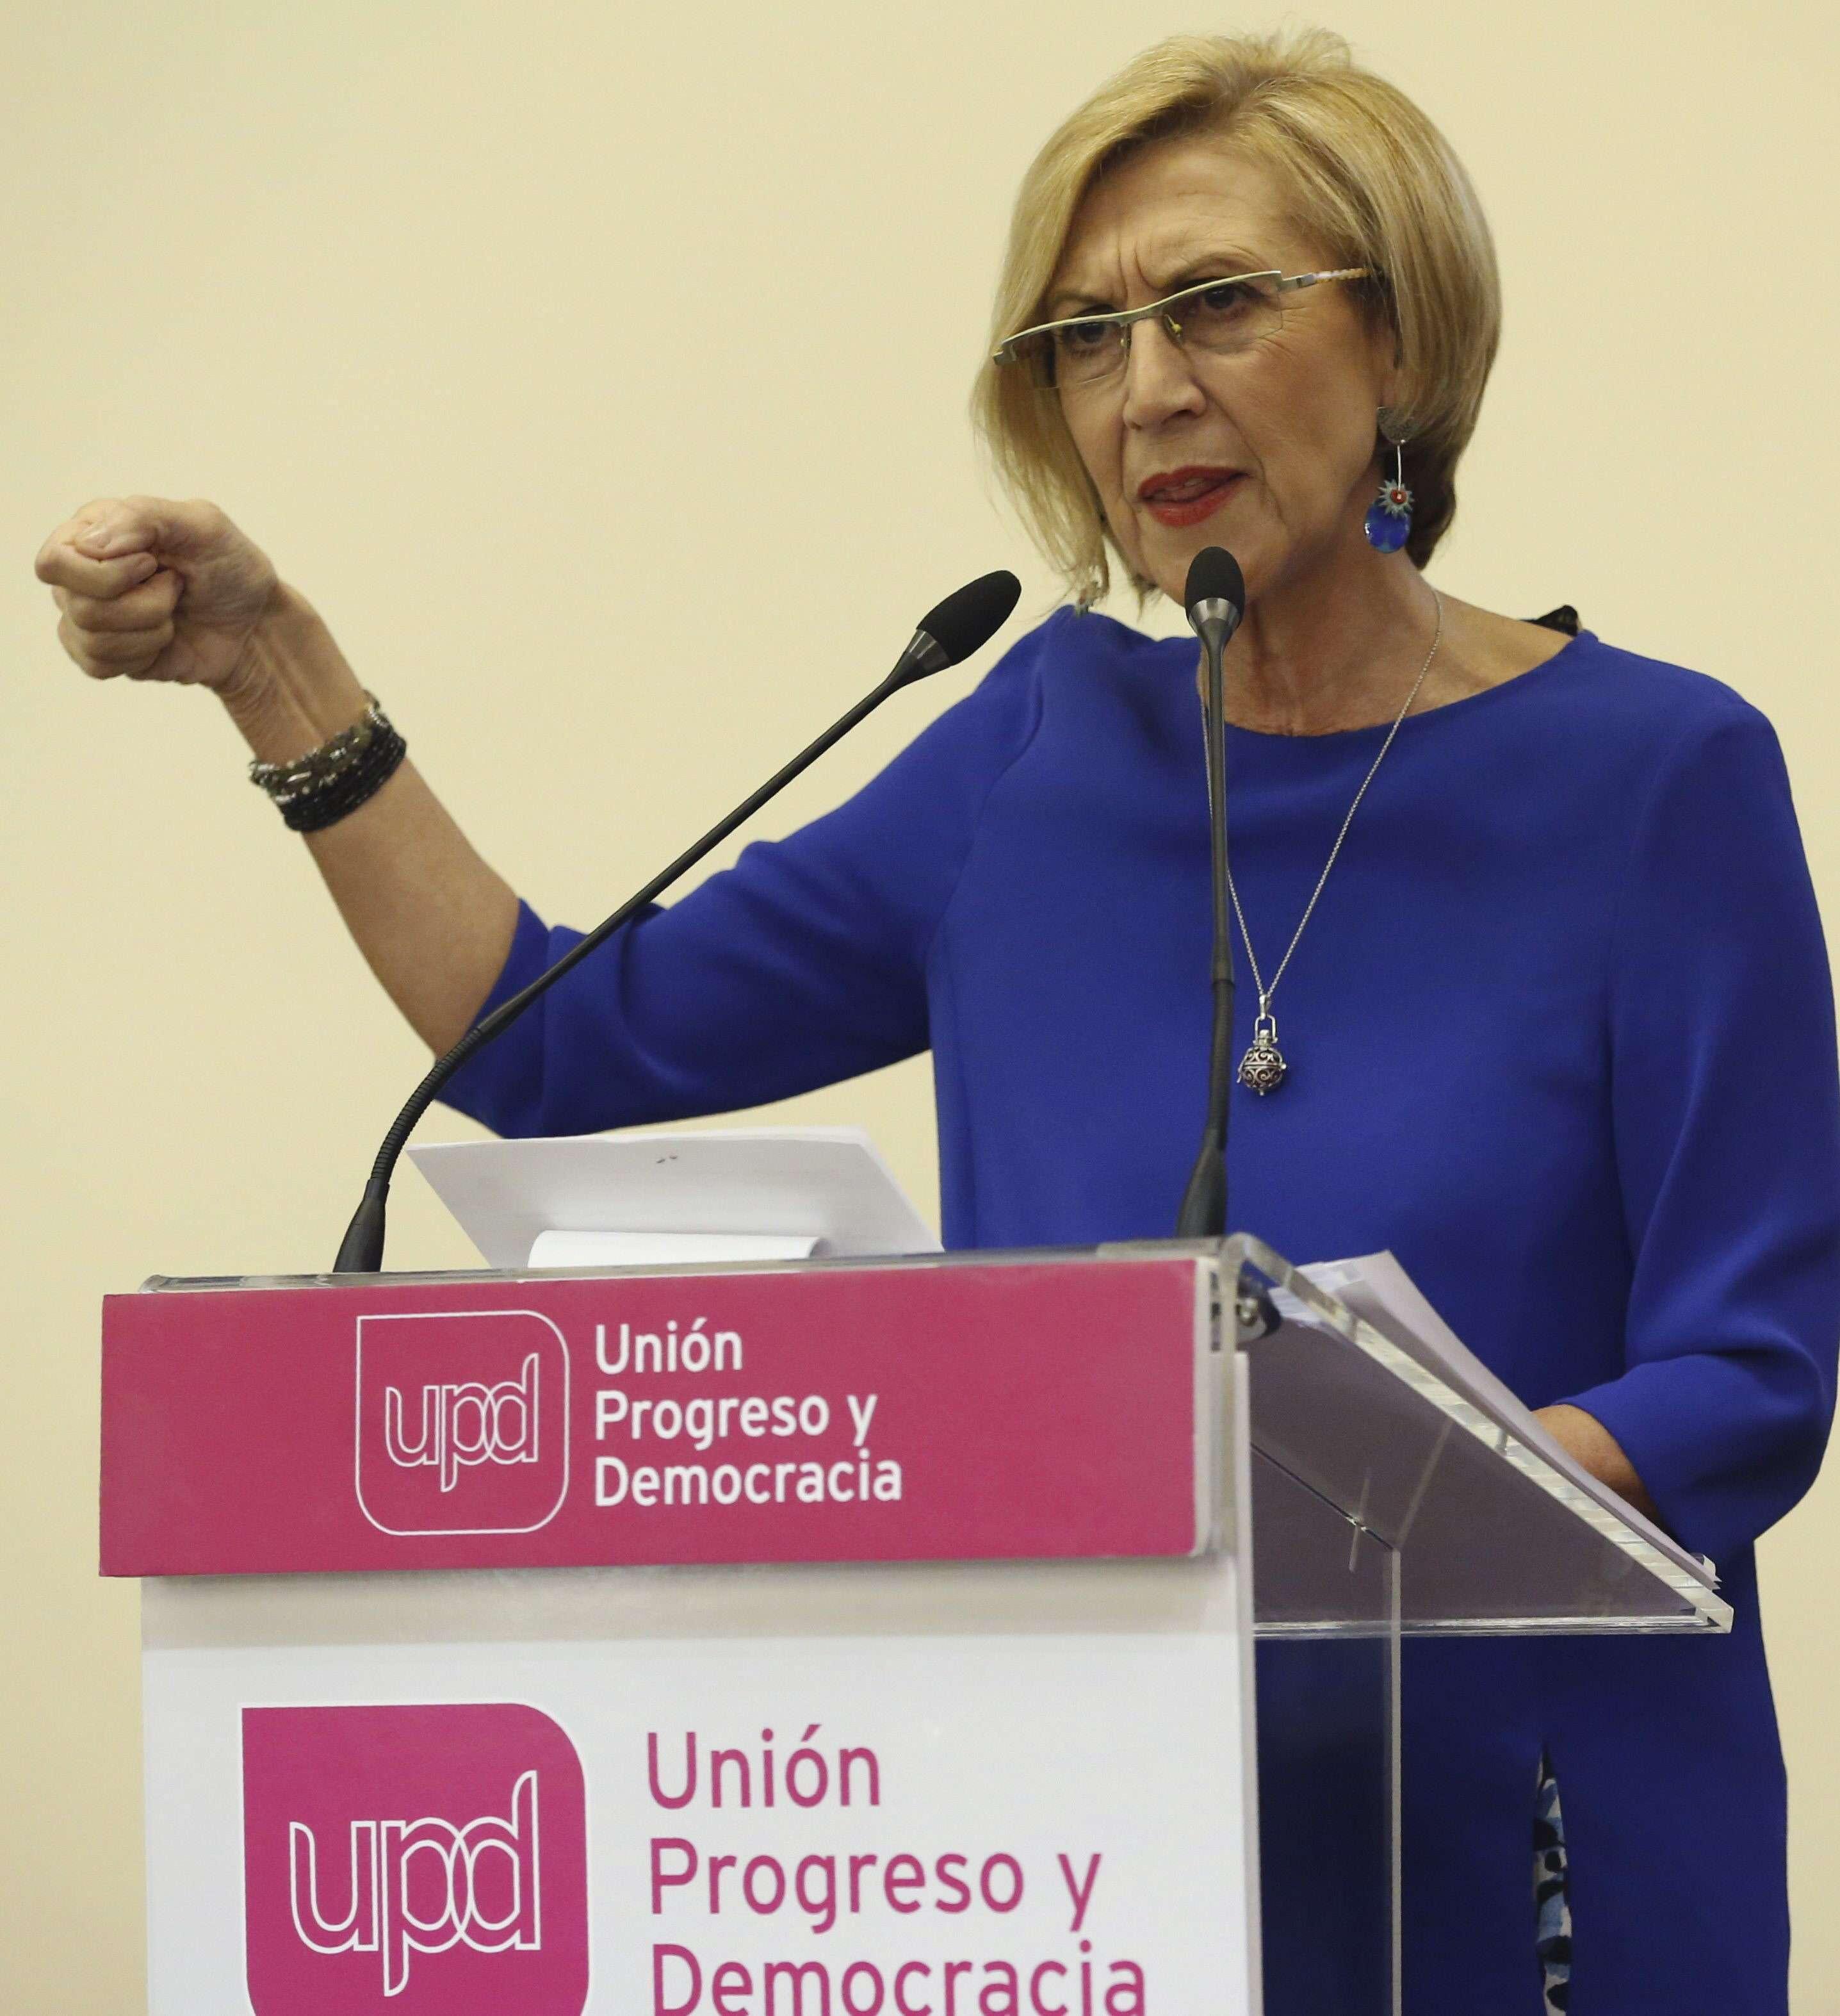 Rosa Díez. Foto: EFE en español